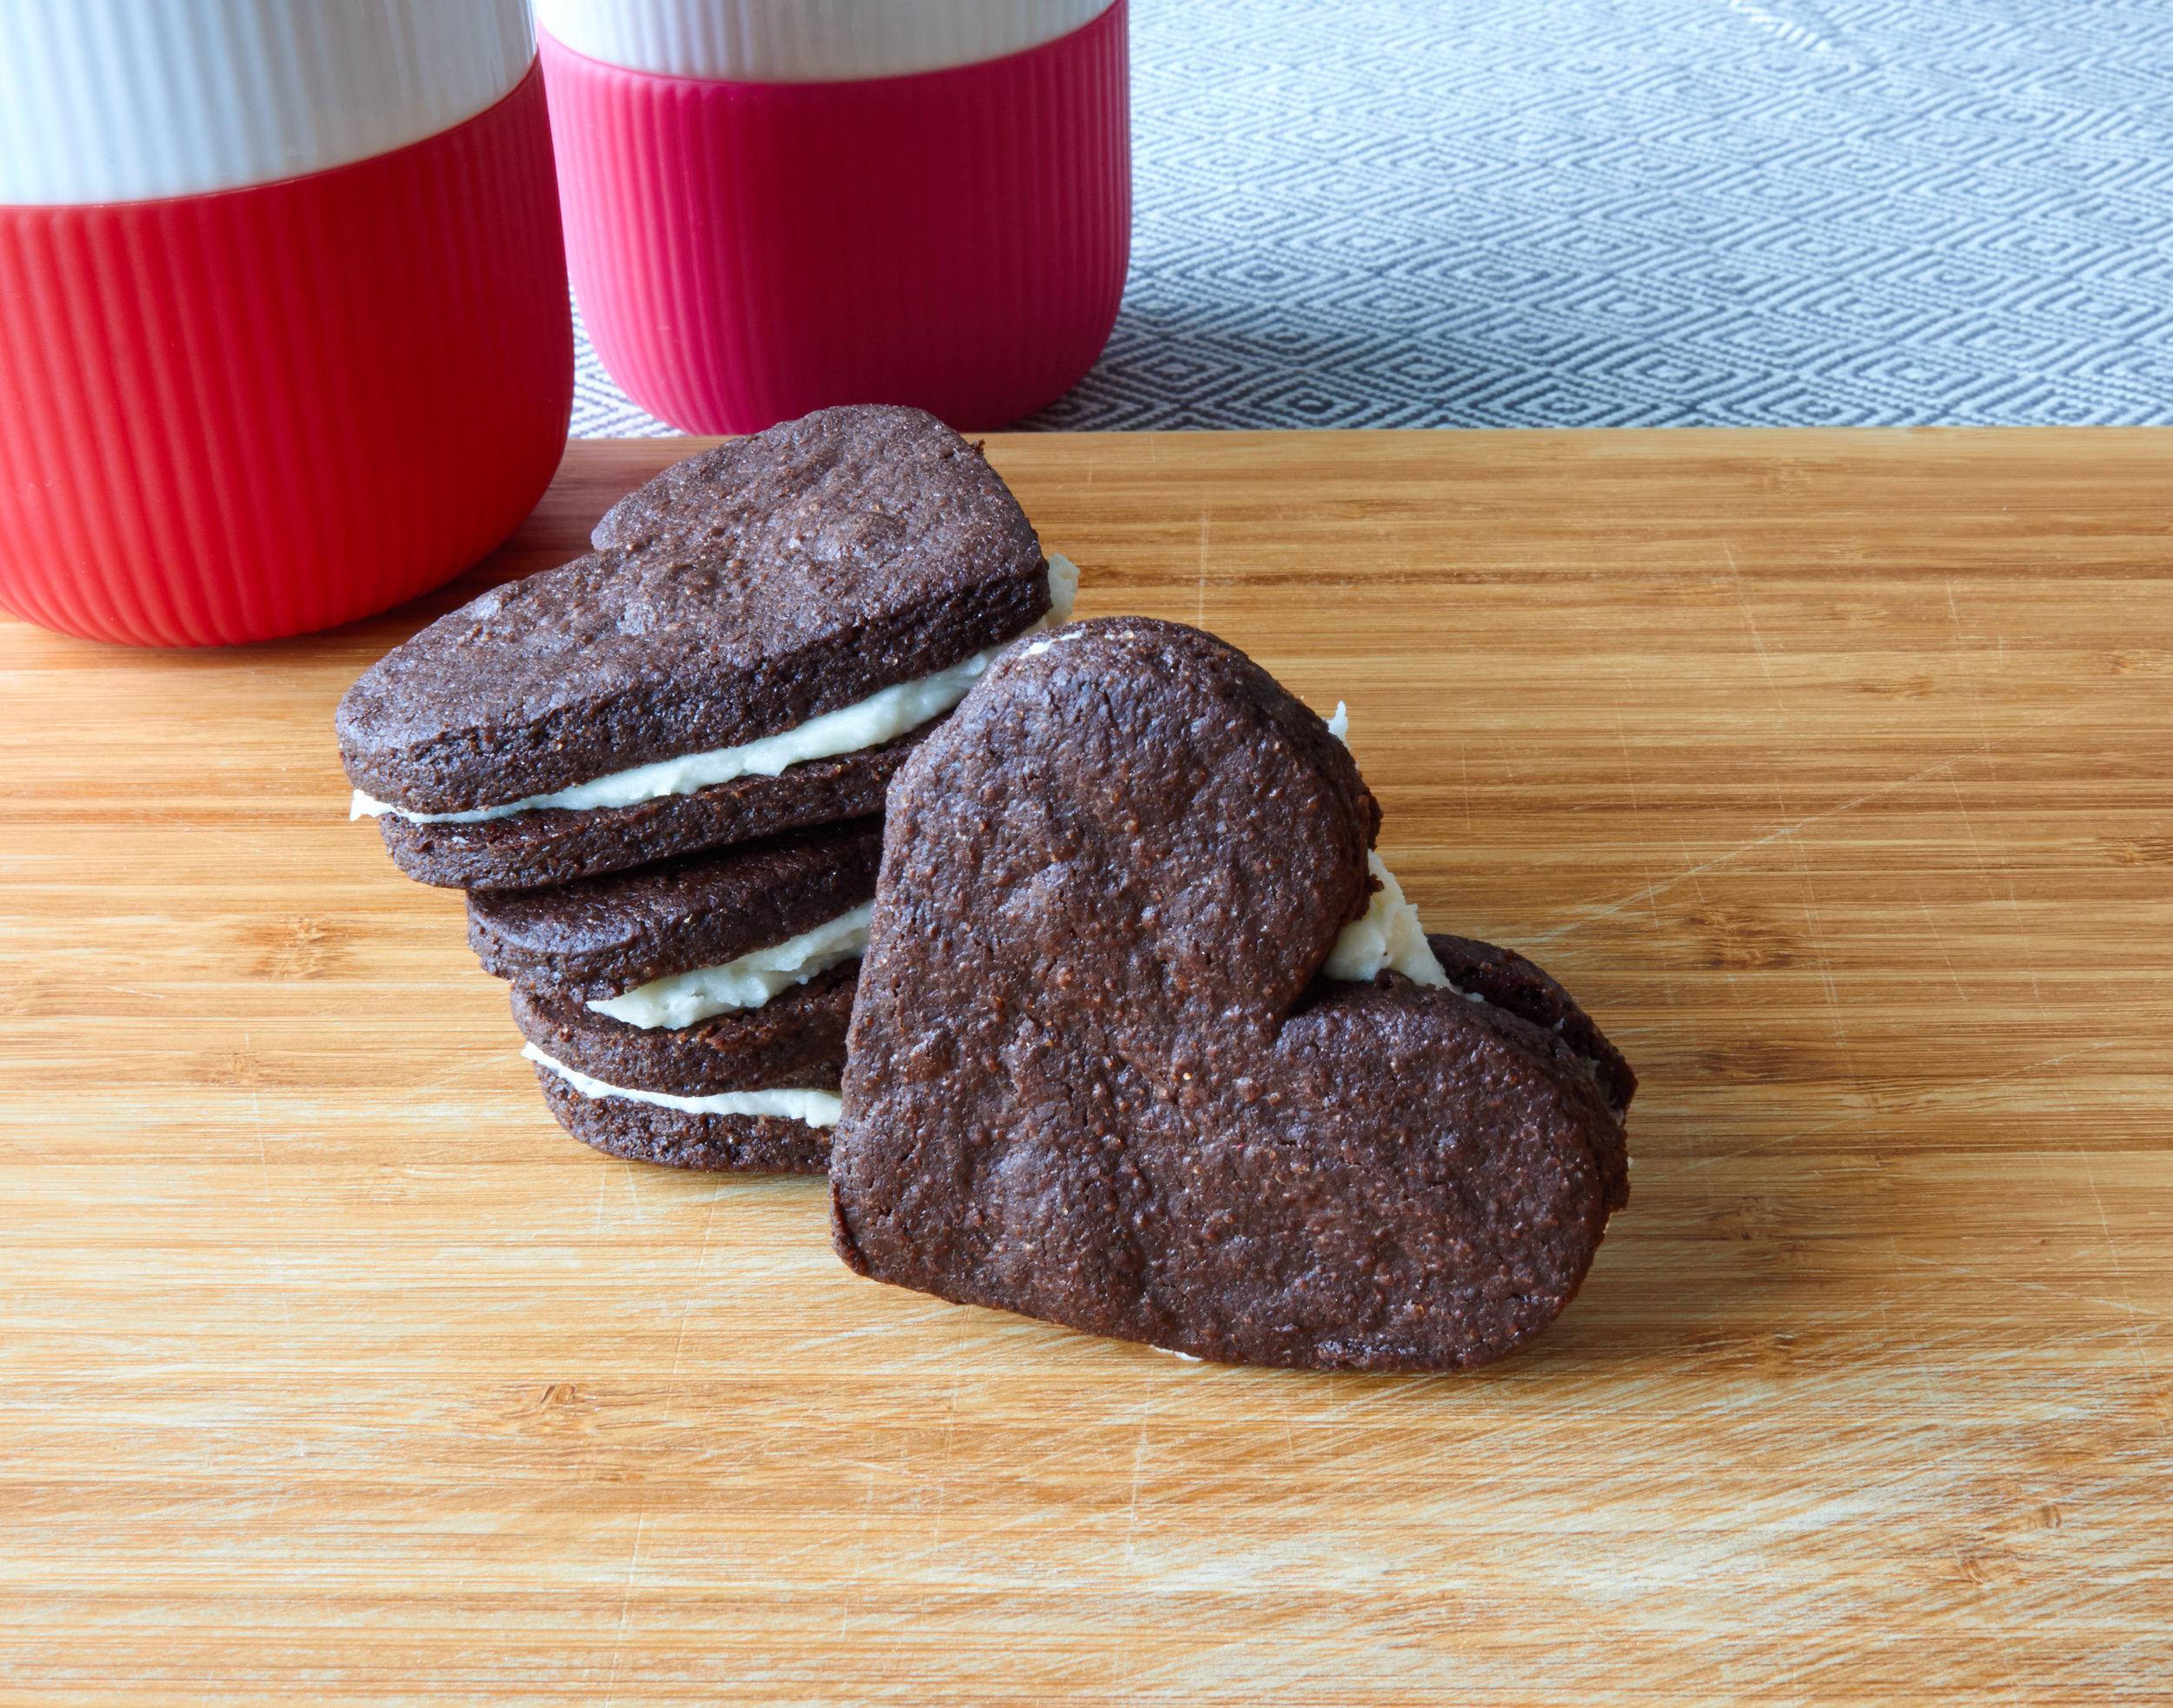 Homemade Oreo Cookies - homemade Oreos, ready to eat | In Carina's Kitchen